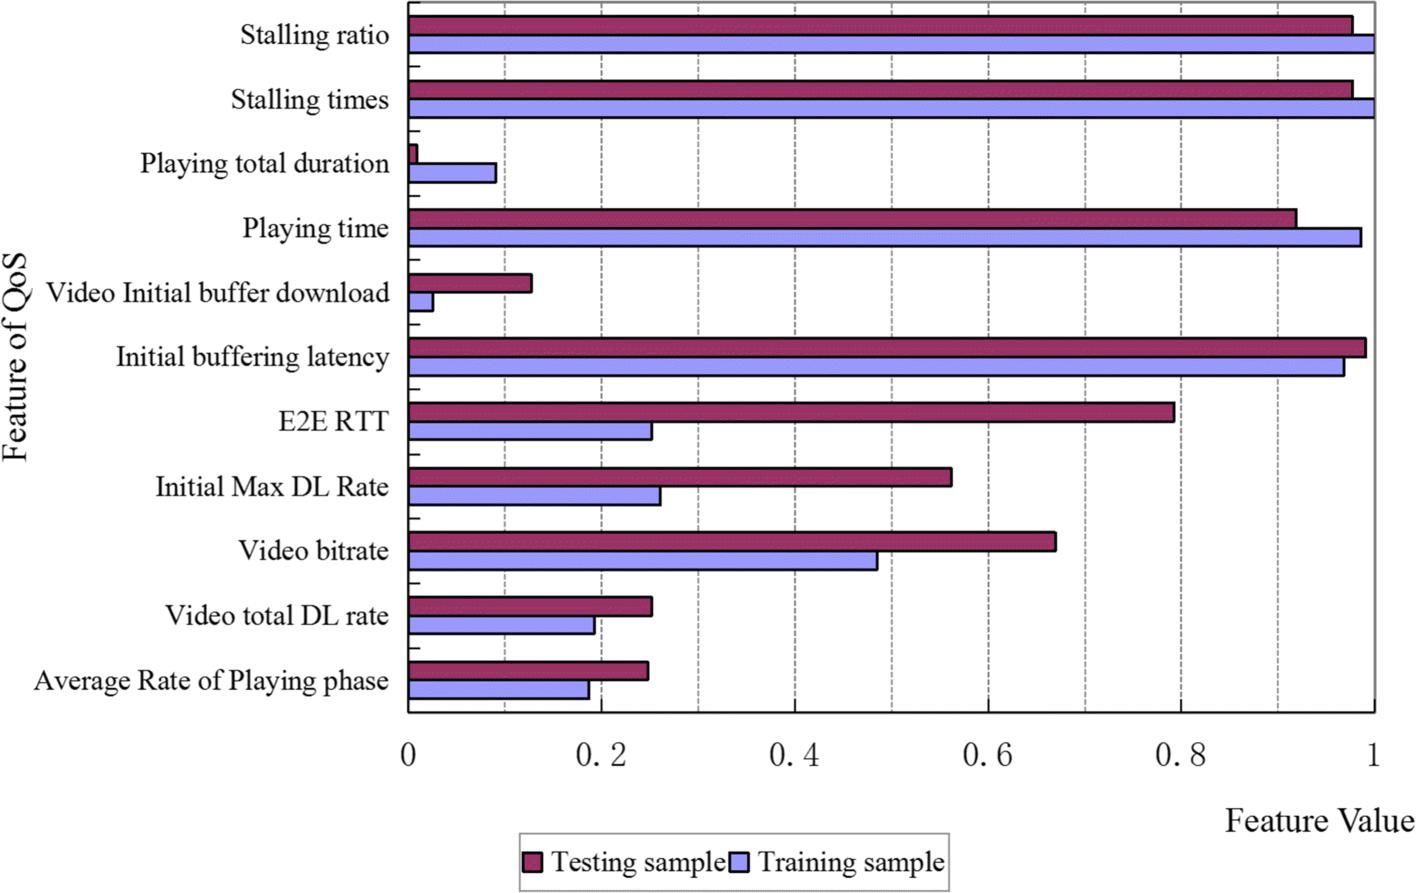 Data analysis on video streaming QoE over mobile networks